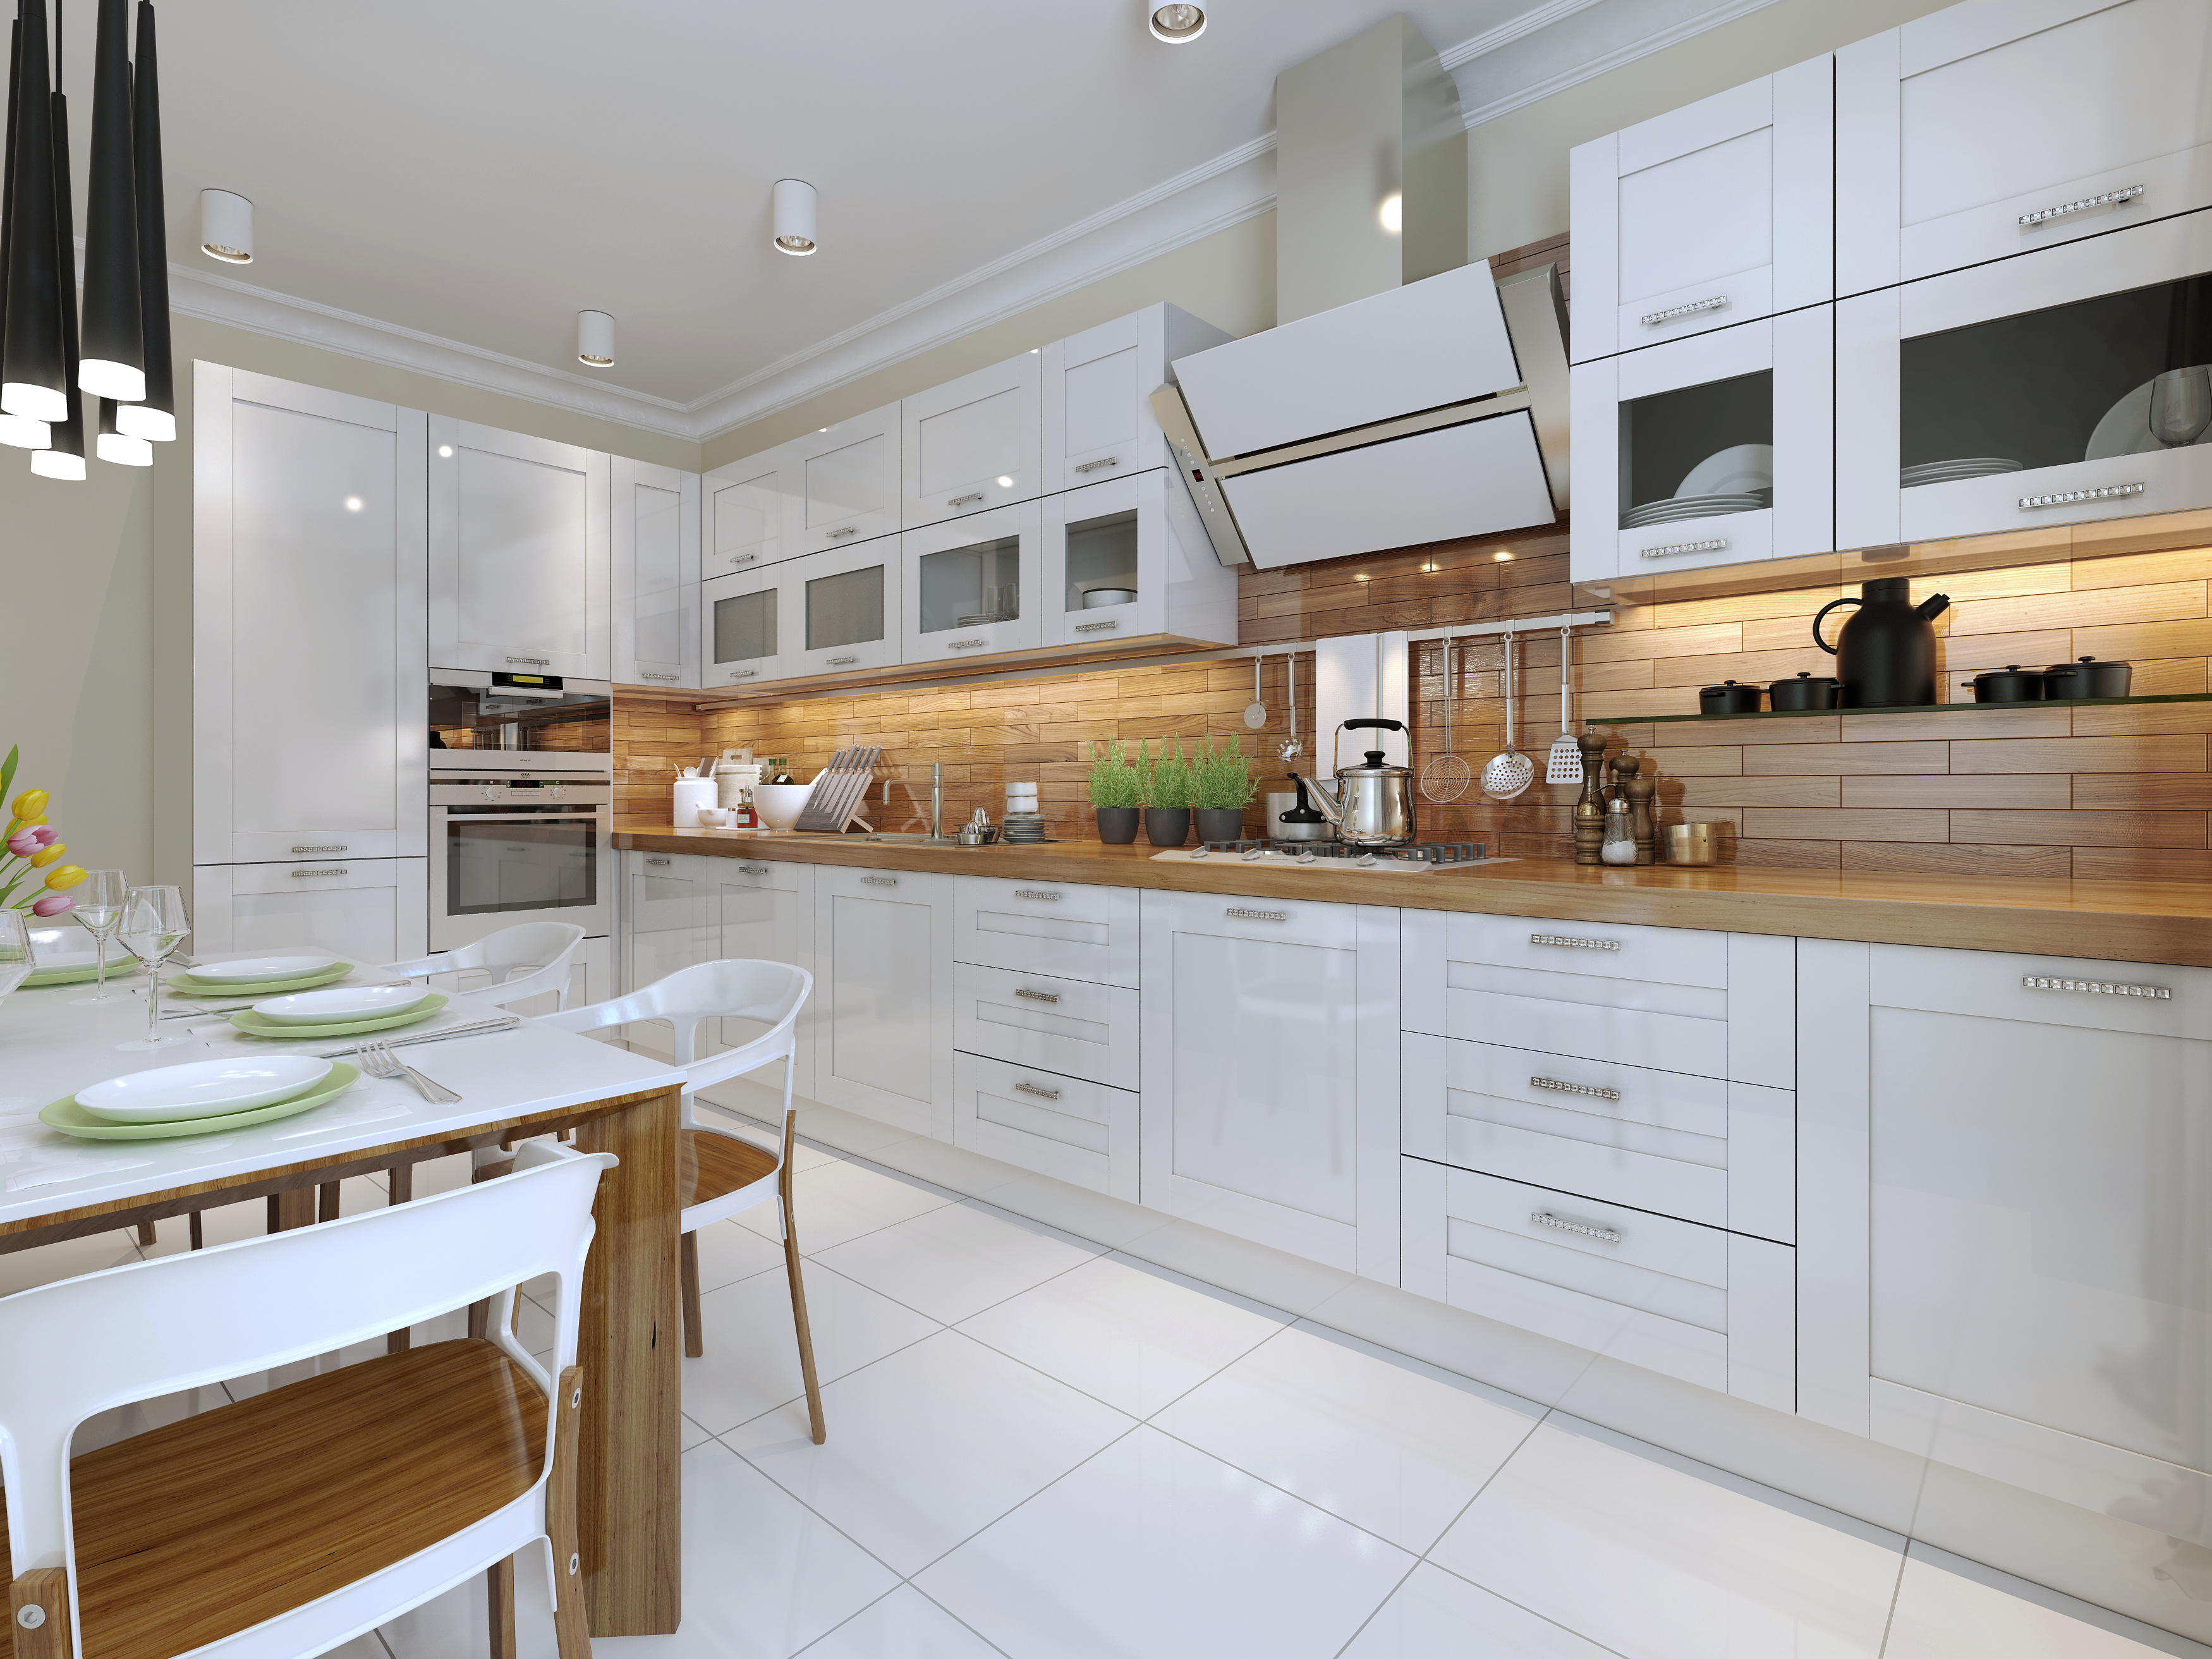 Incredible Modern Kitchen - Violet Designs 600 x 581 · 59 kB · jpeg